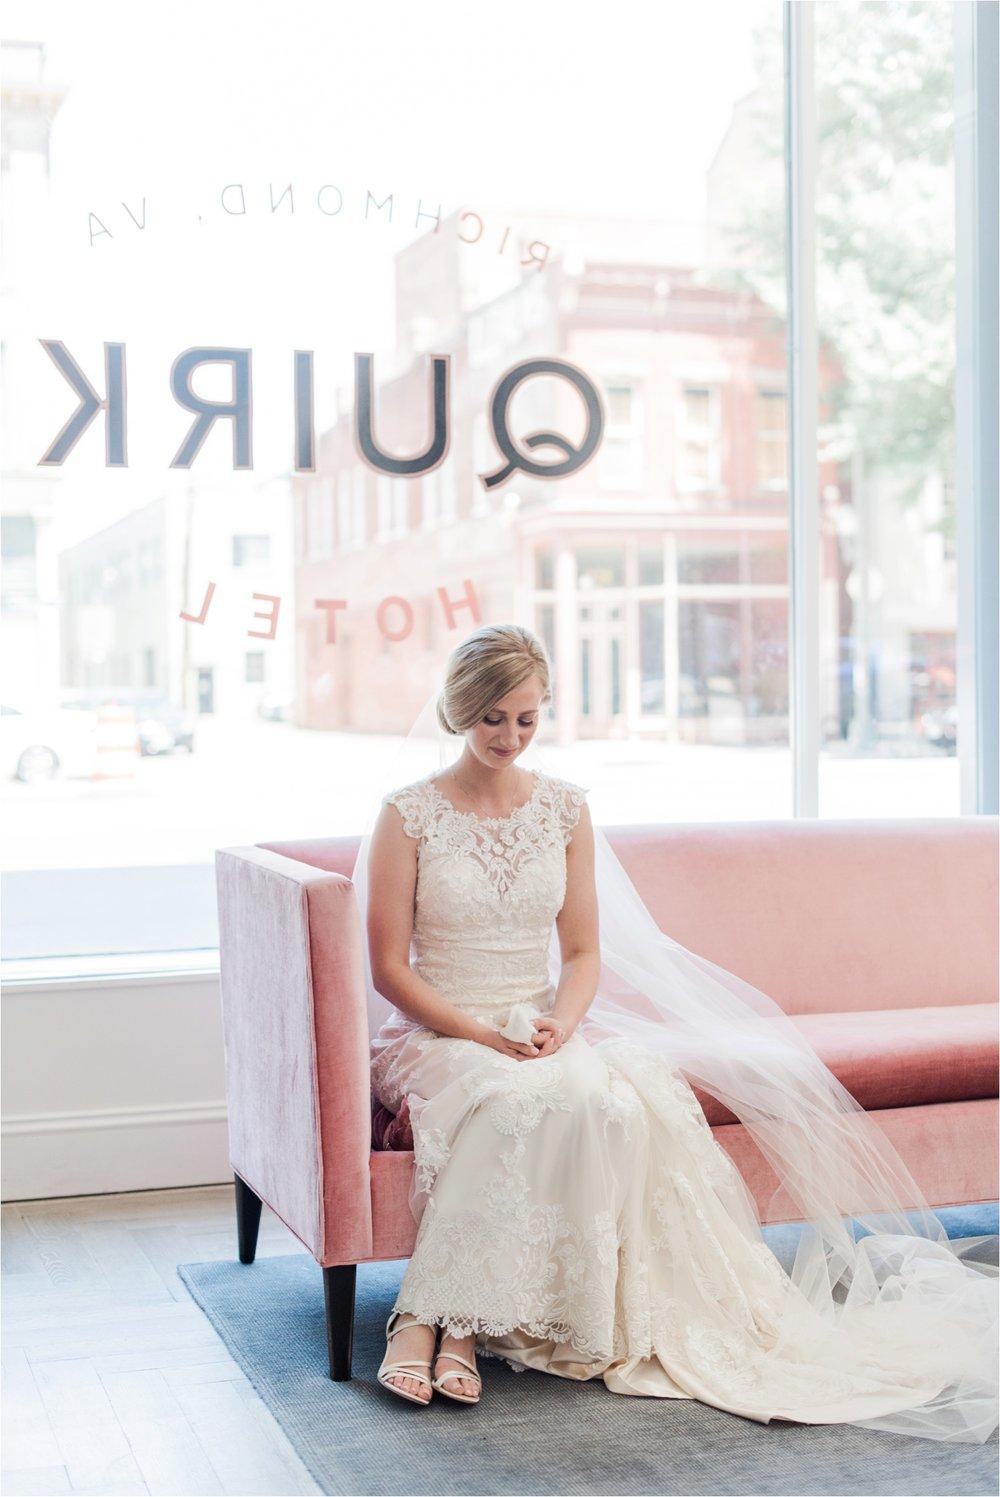 virginia-wedding-photographer-theoverlook-wedding-photo_0018.jpg